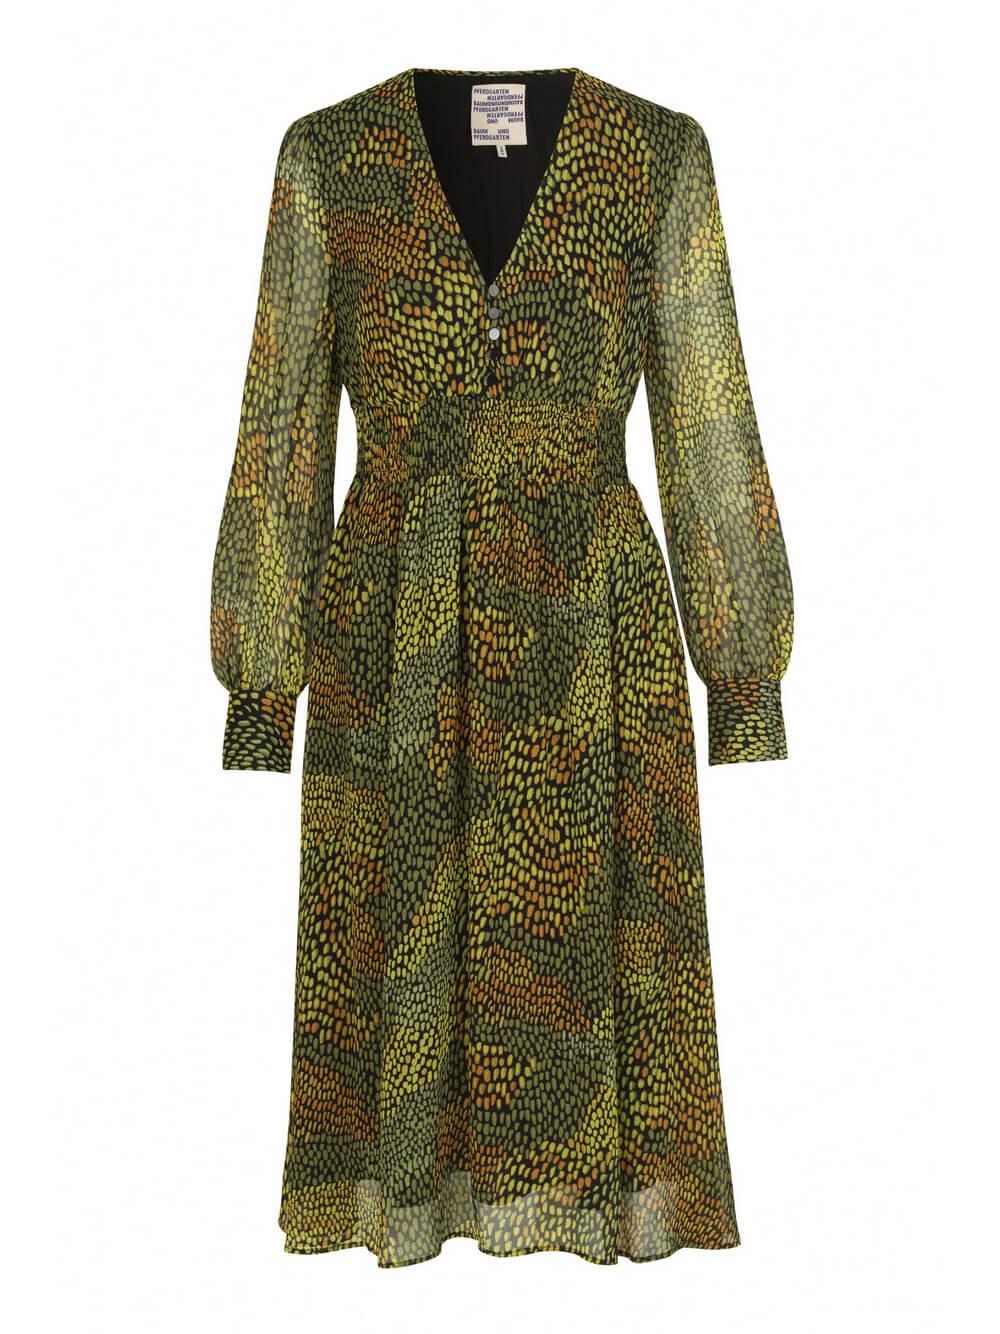 Akelly Dress Item # 21217